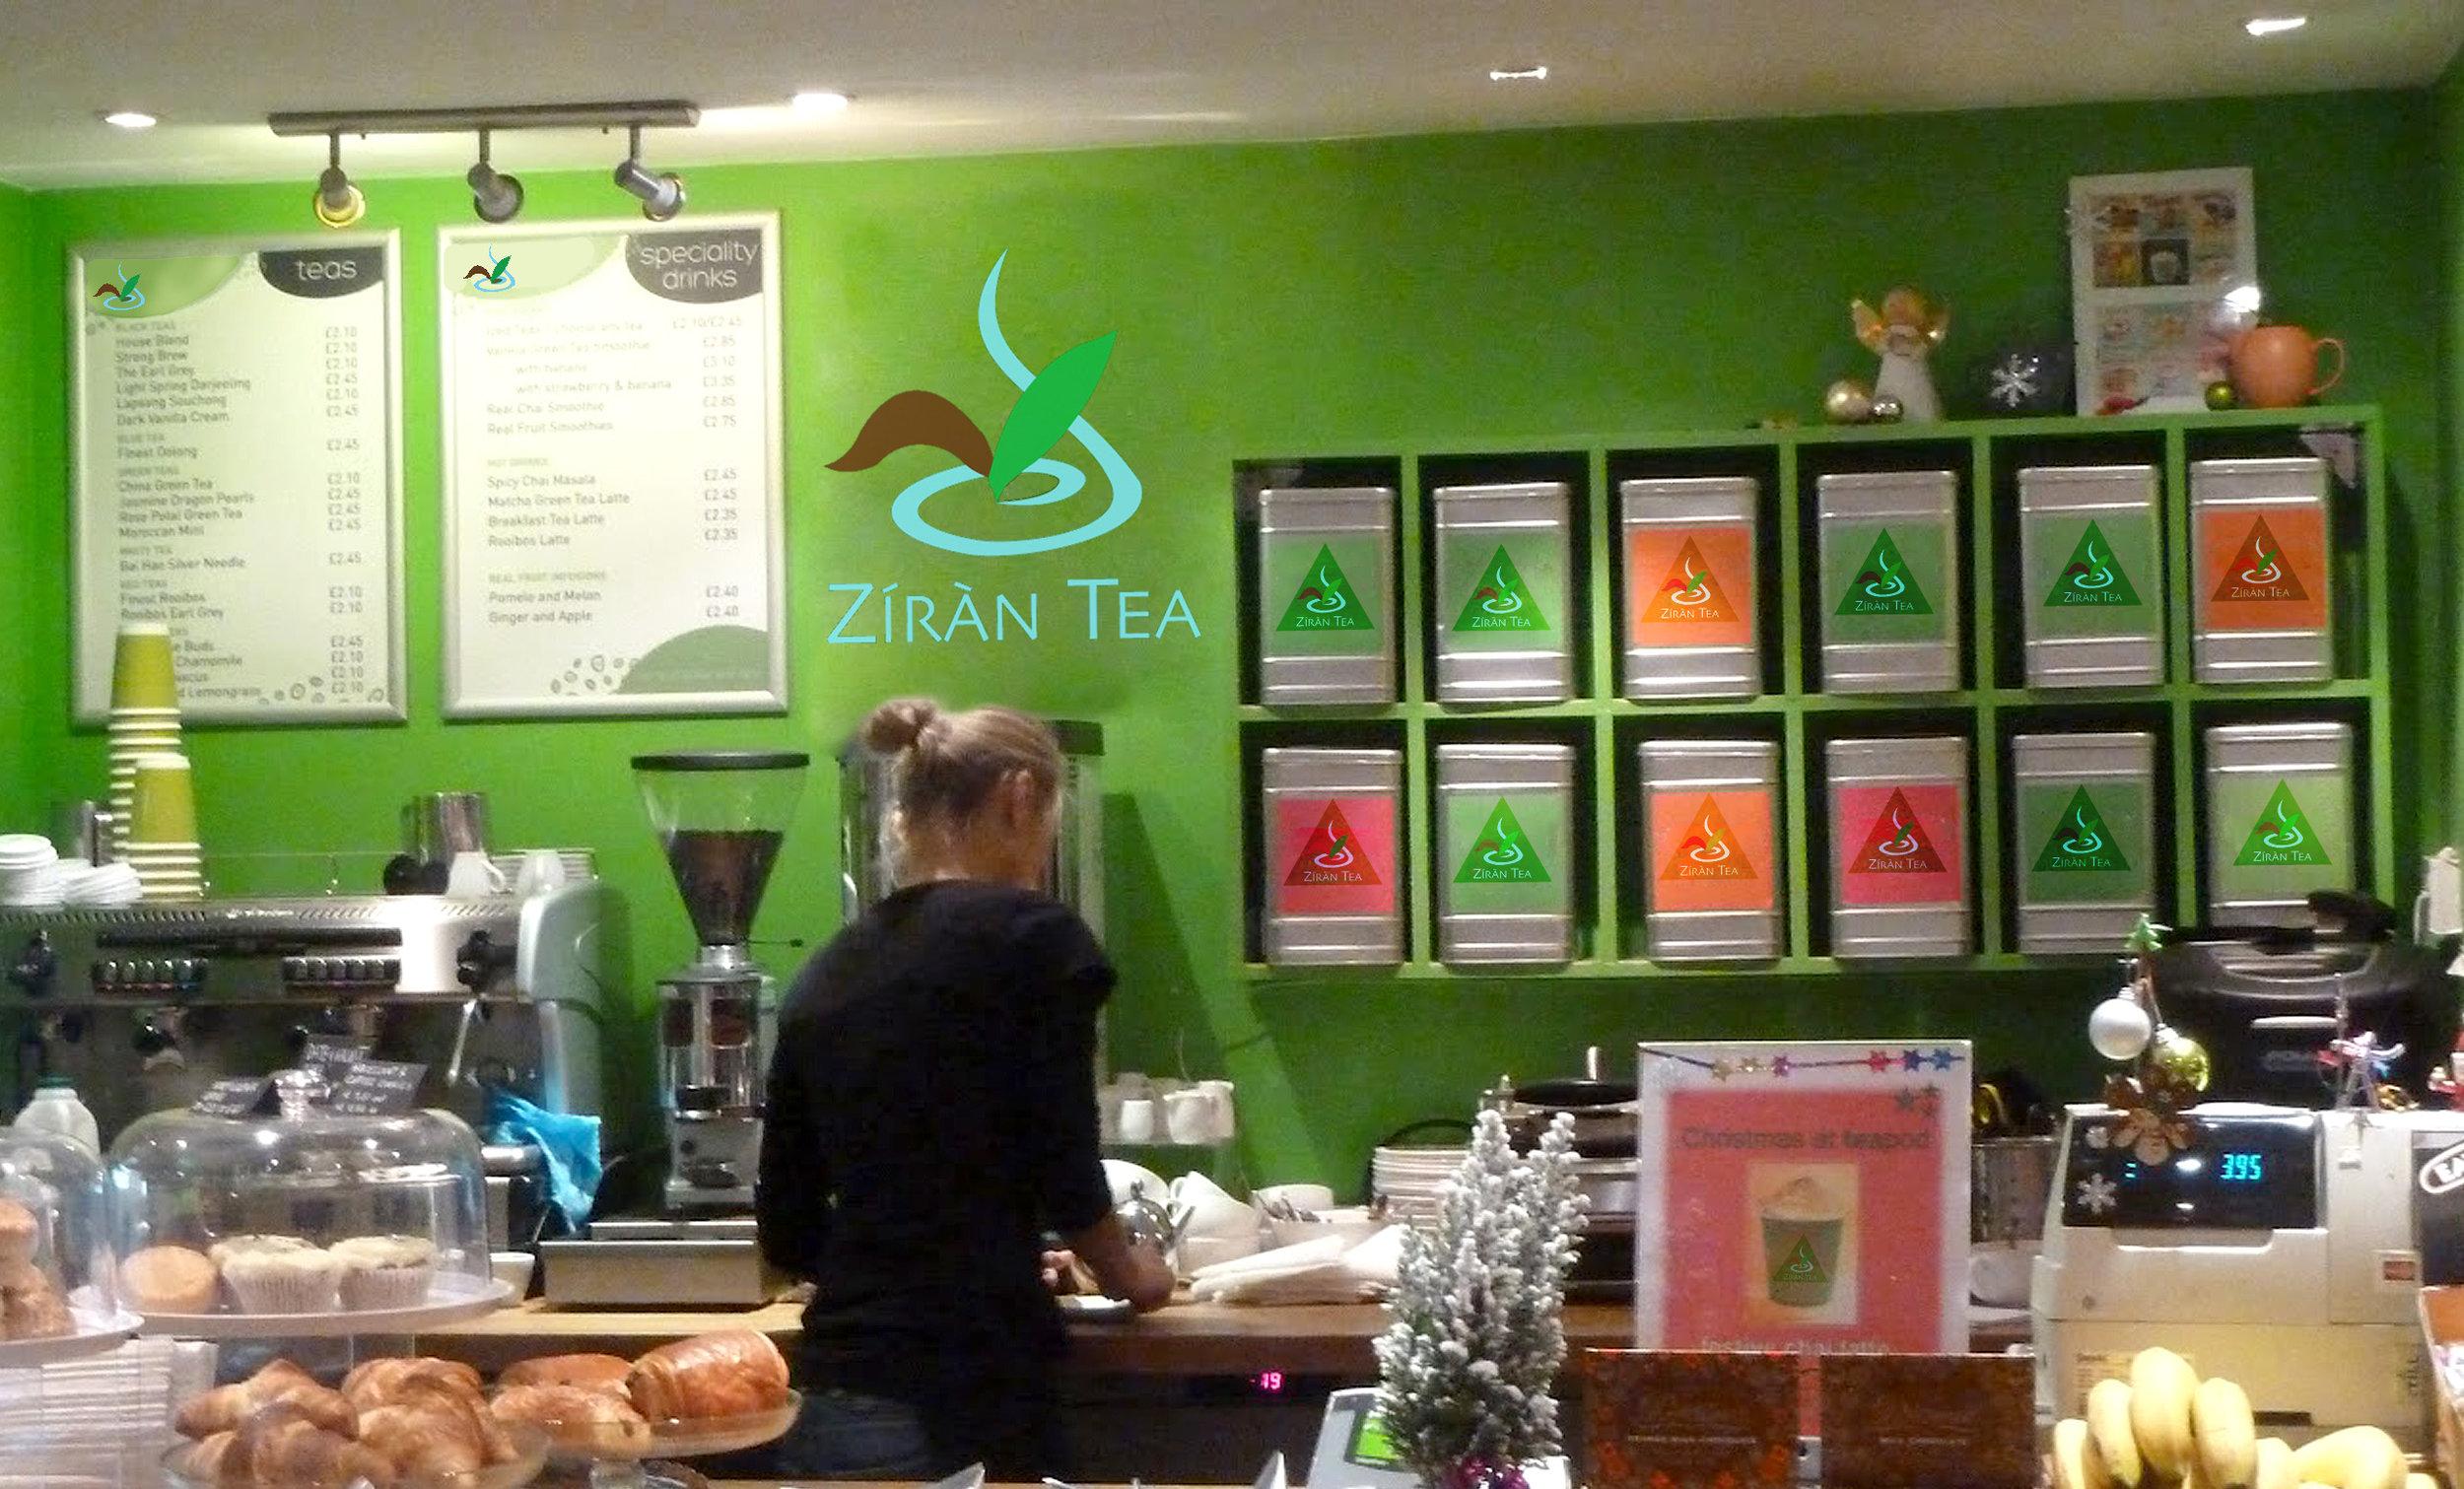 A mock-up of a Ziran Tea café location